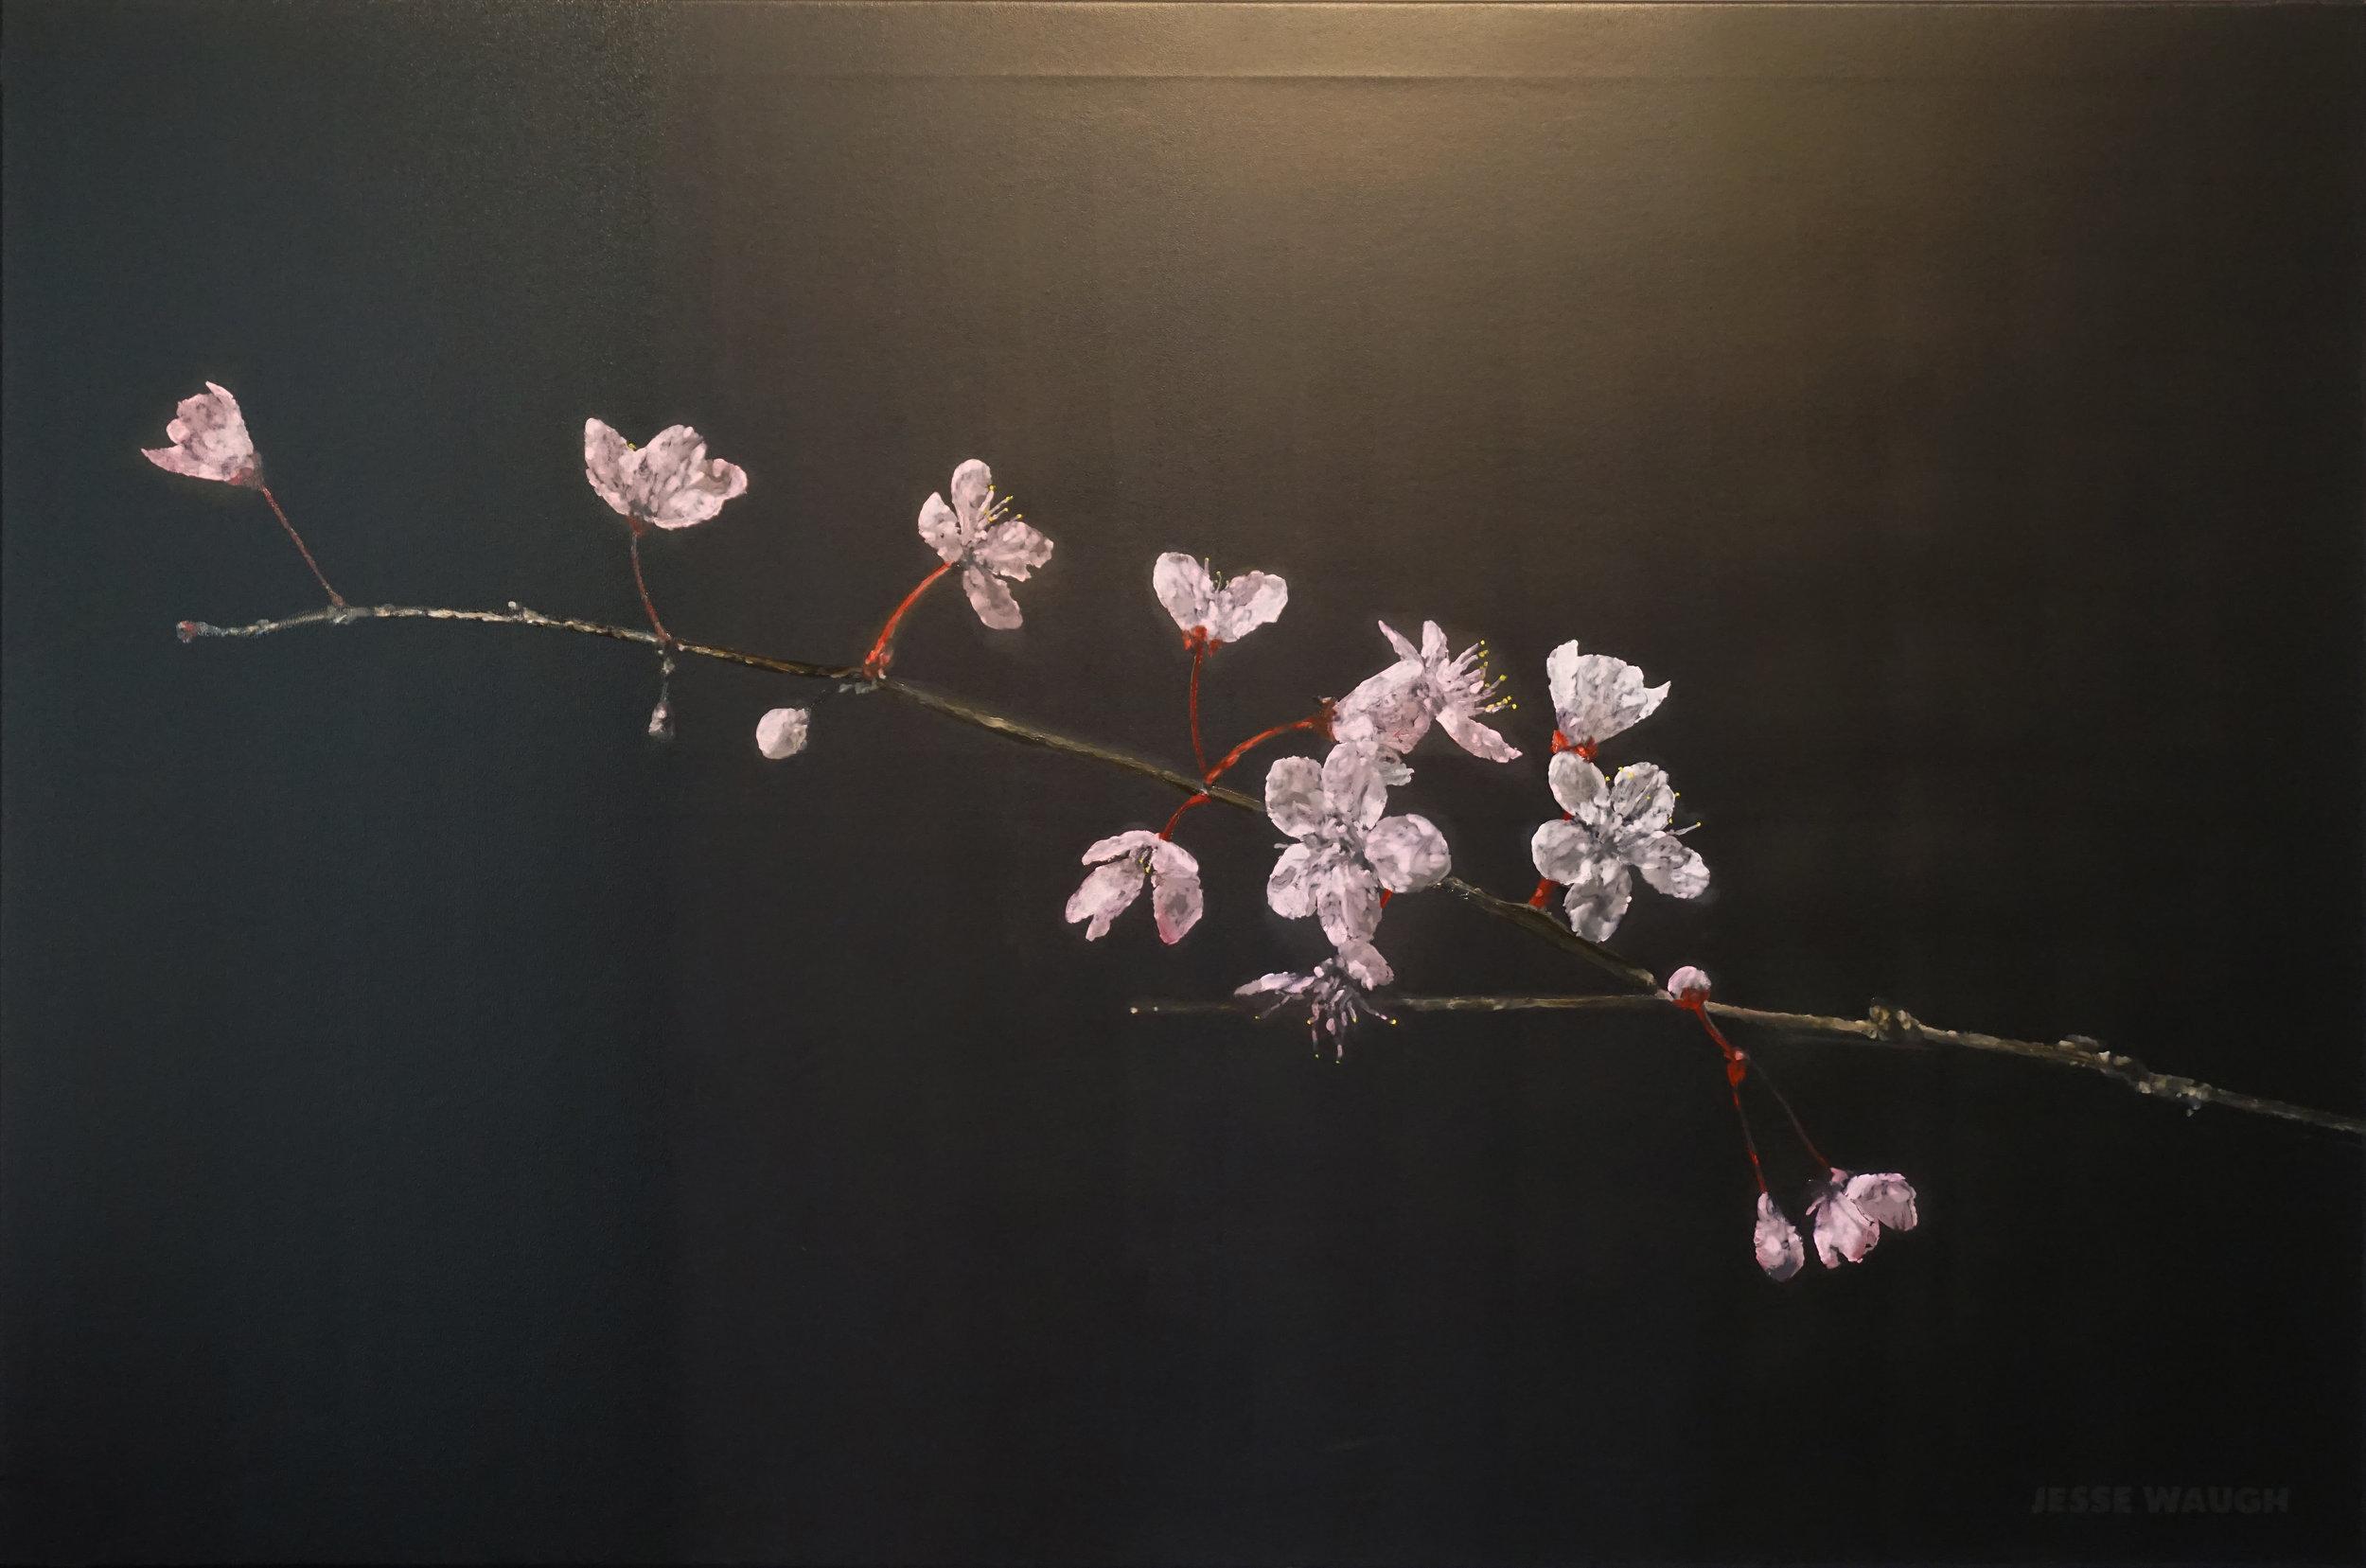 2017-04-22-Cherry-Blossoms-adytum-JESSE-WAUGH-jessewaugh.com.jpg